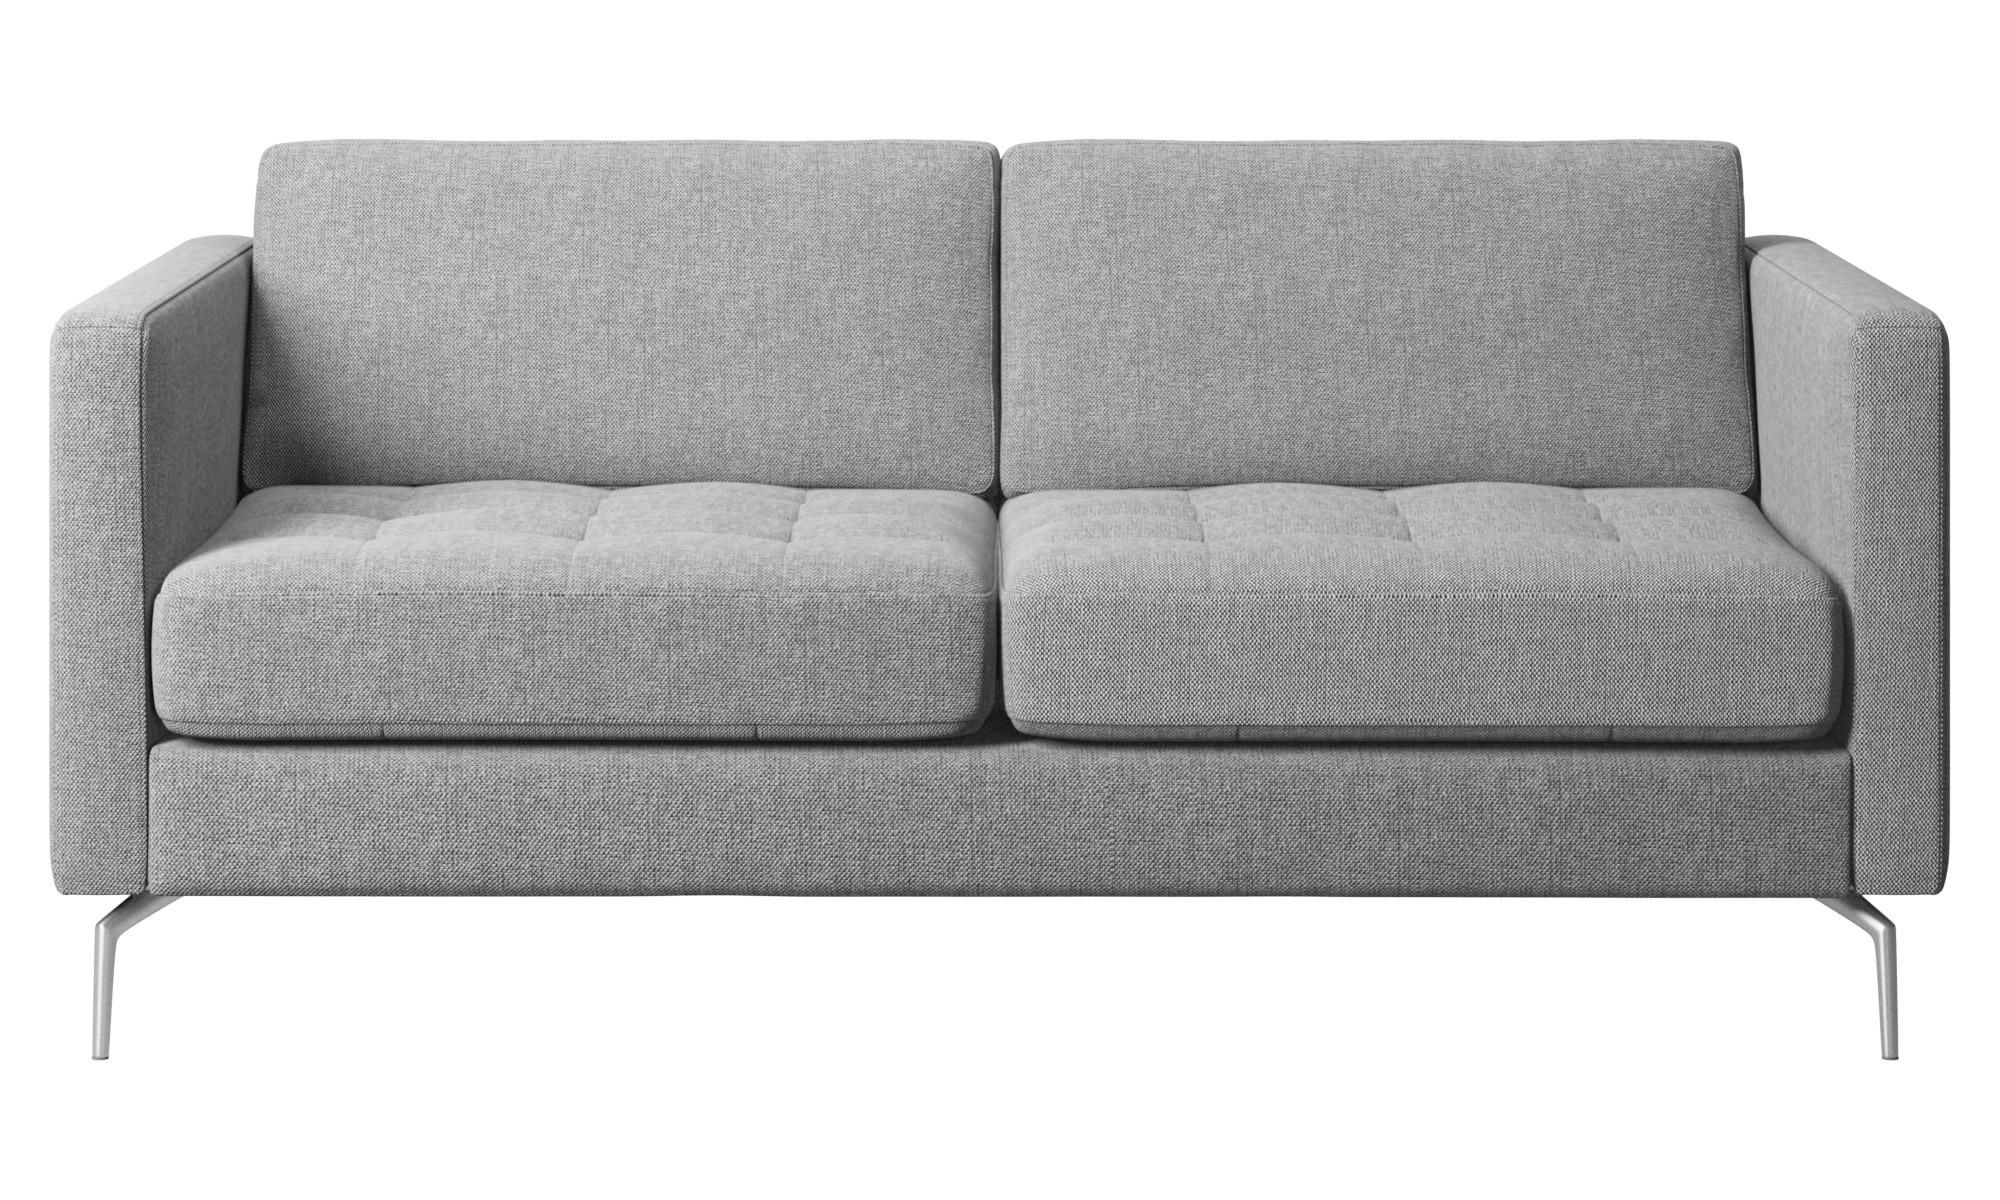 2 Seater Sofas Osaka Sofa Tufted